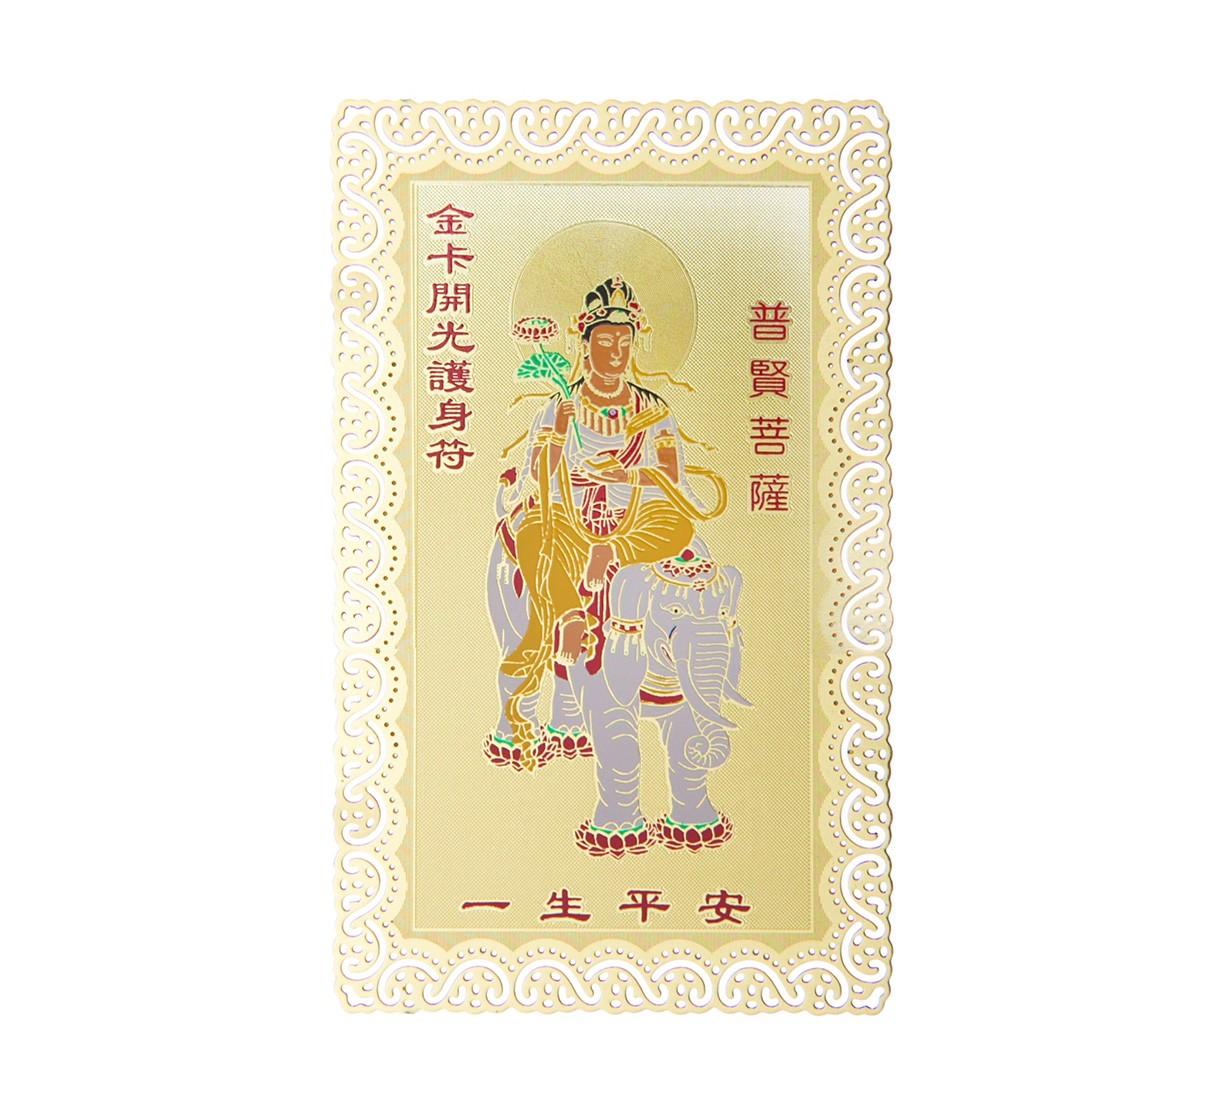 Samantabhadra asezata pe Elefantul Alb - placa metalica